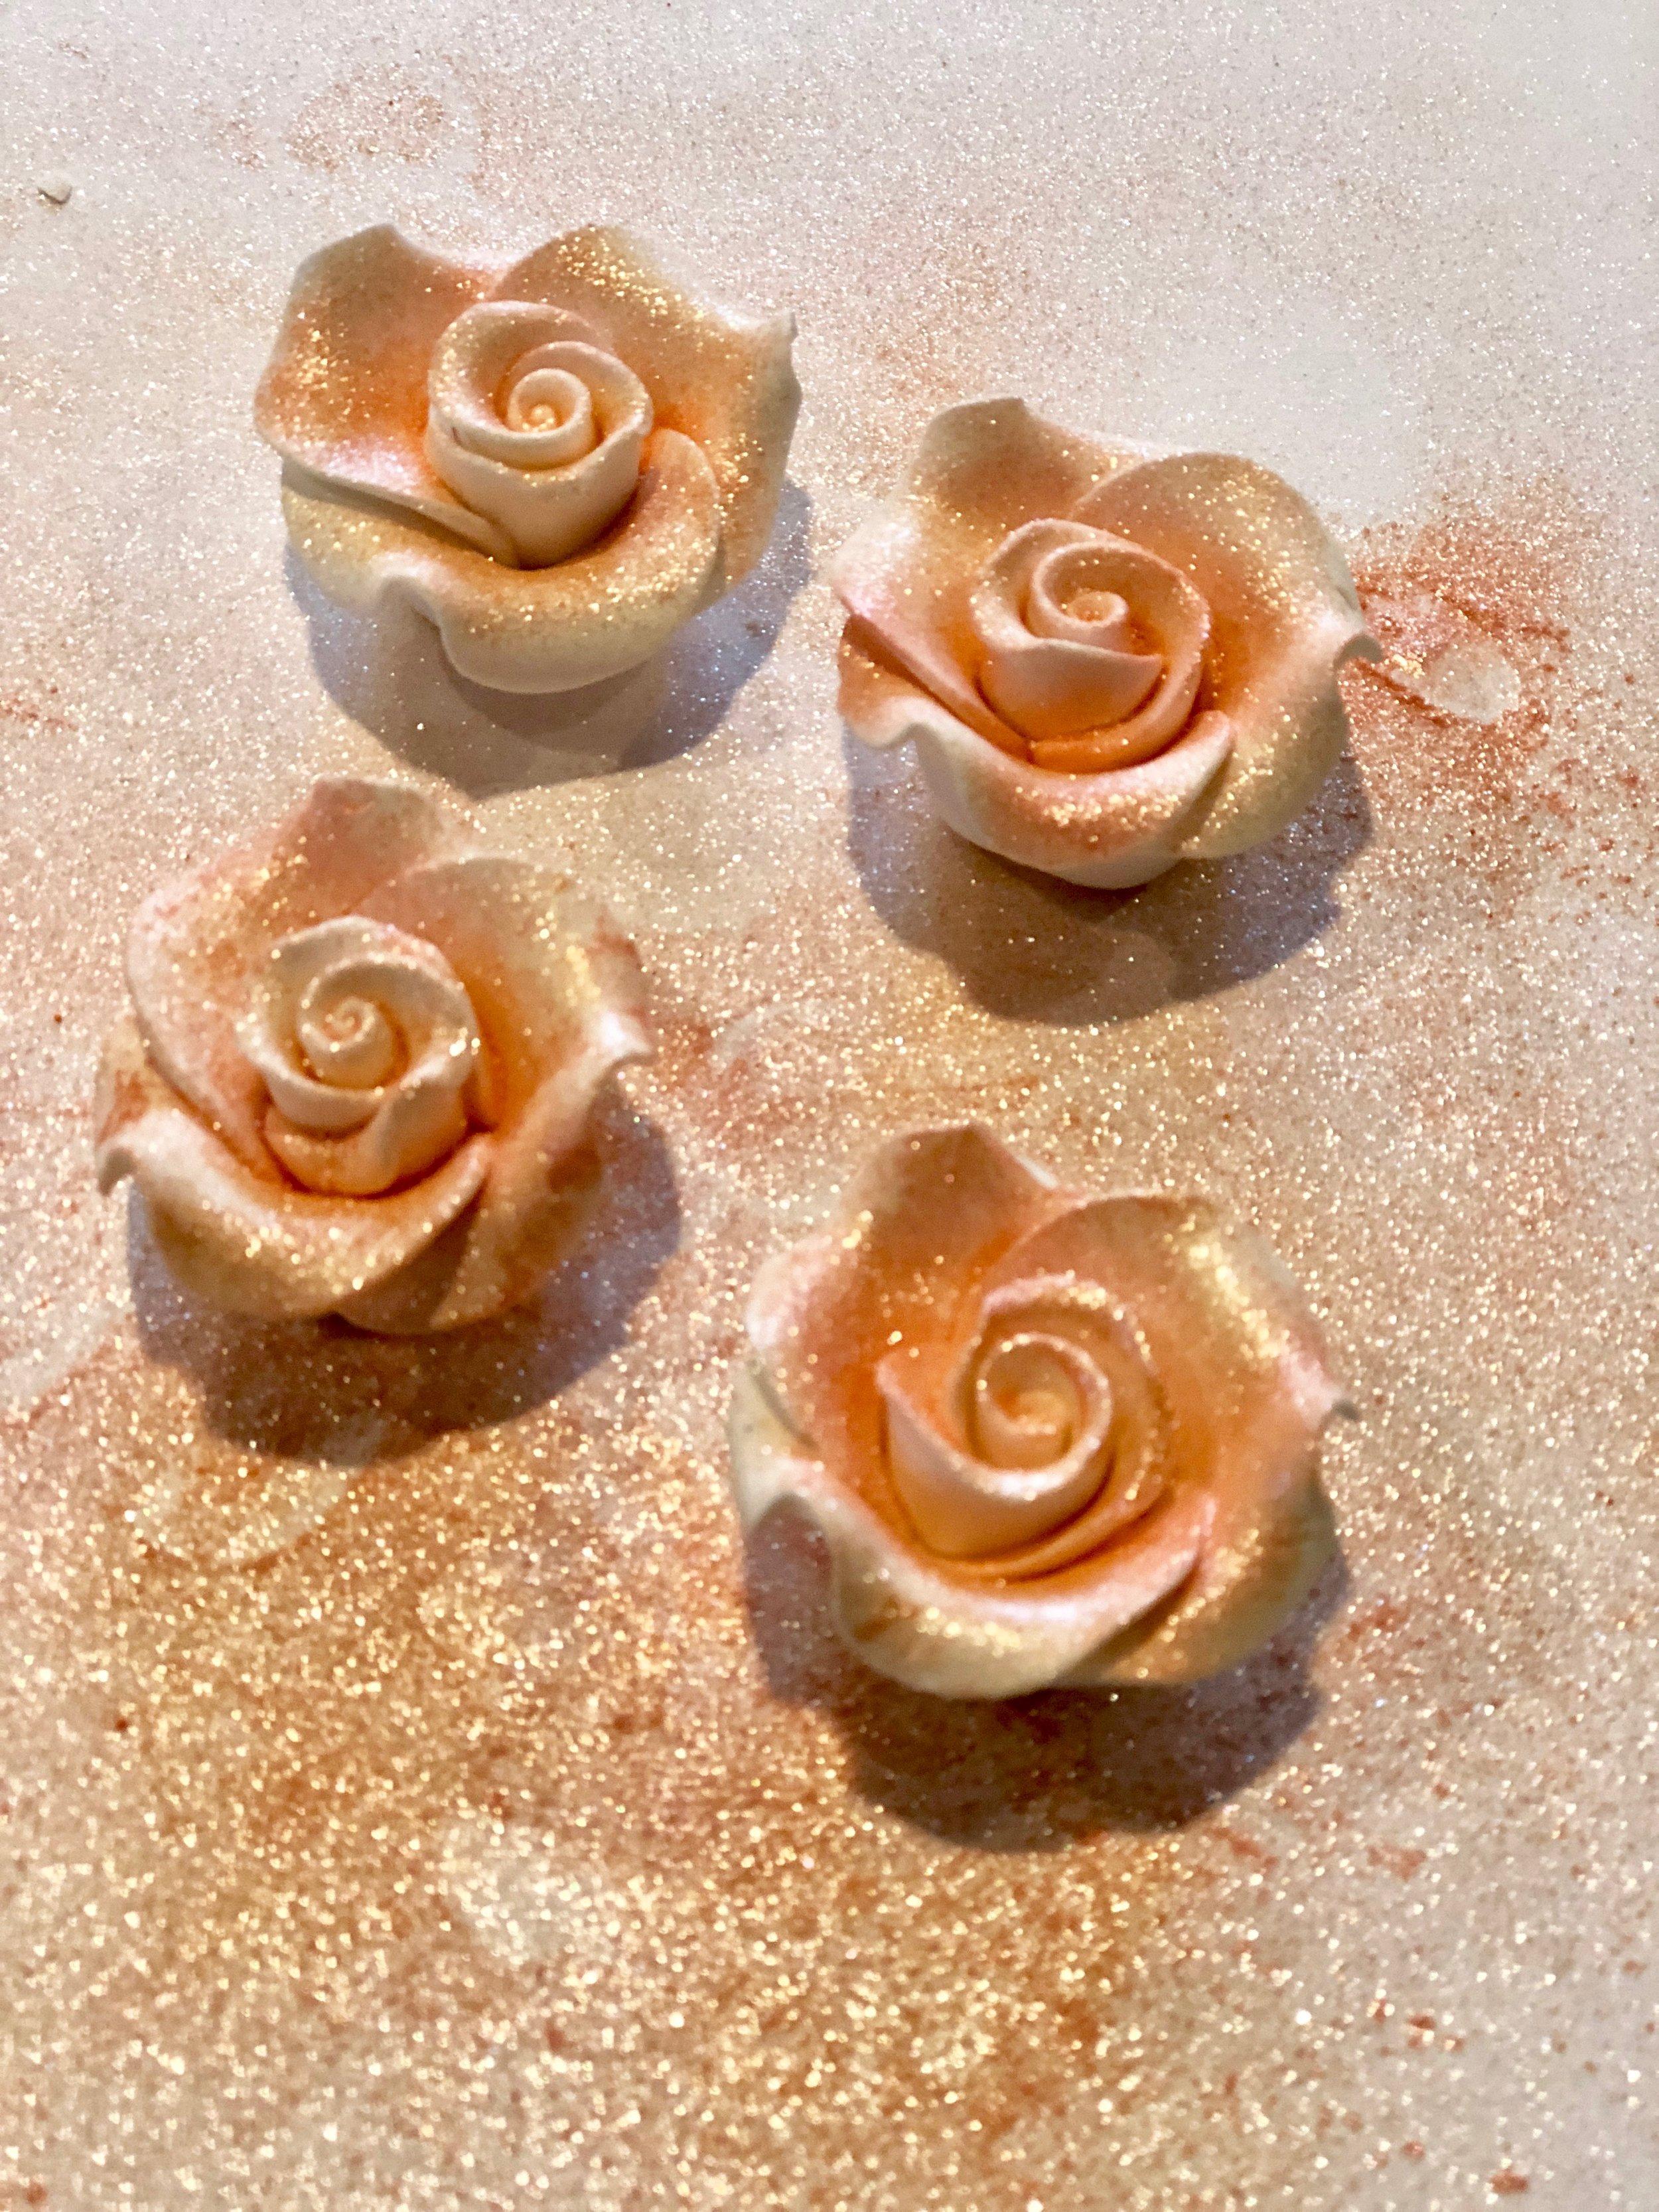 wilton rose gold dust on icing flowers.jpg